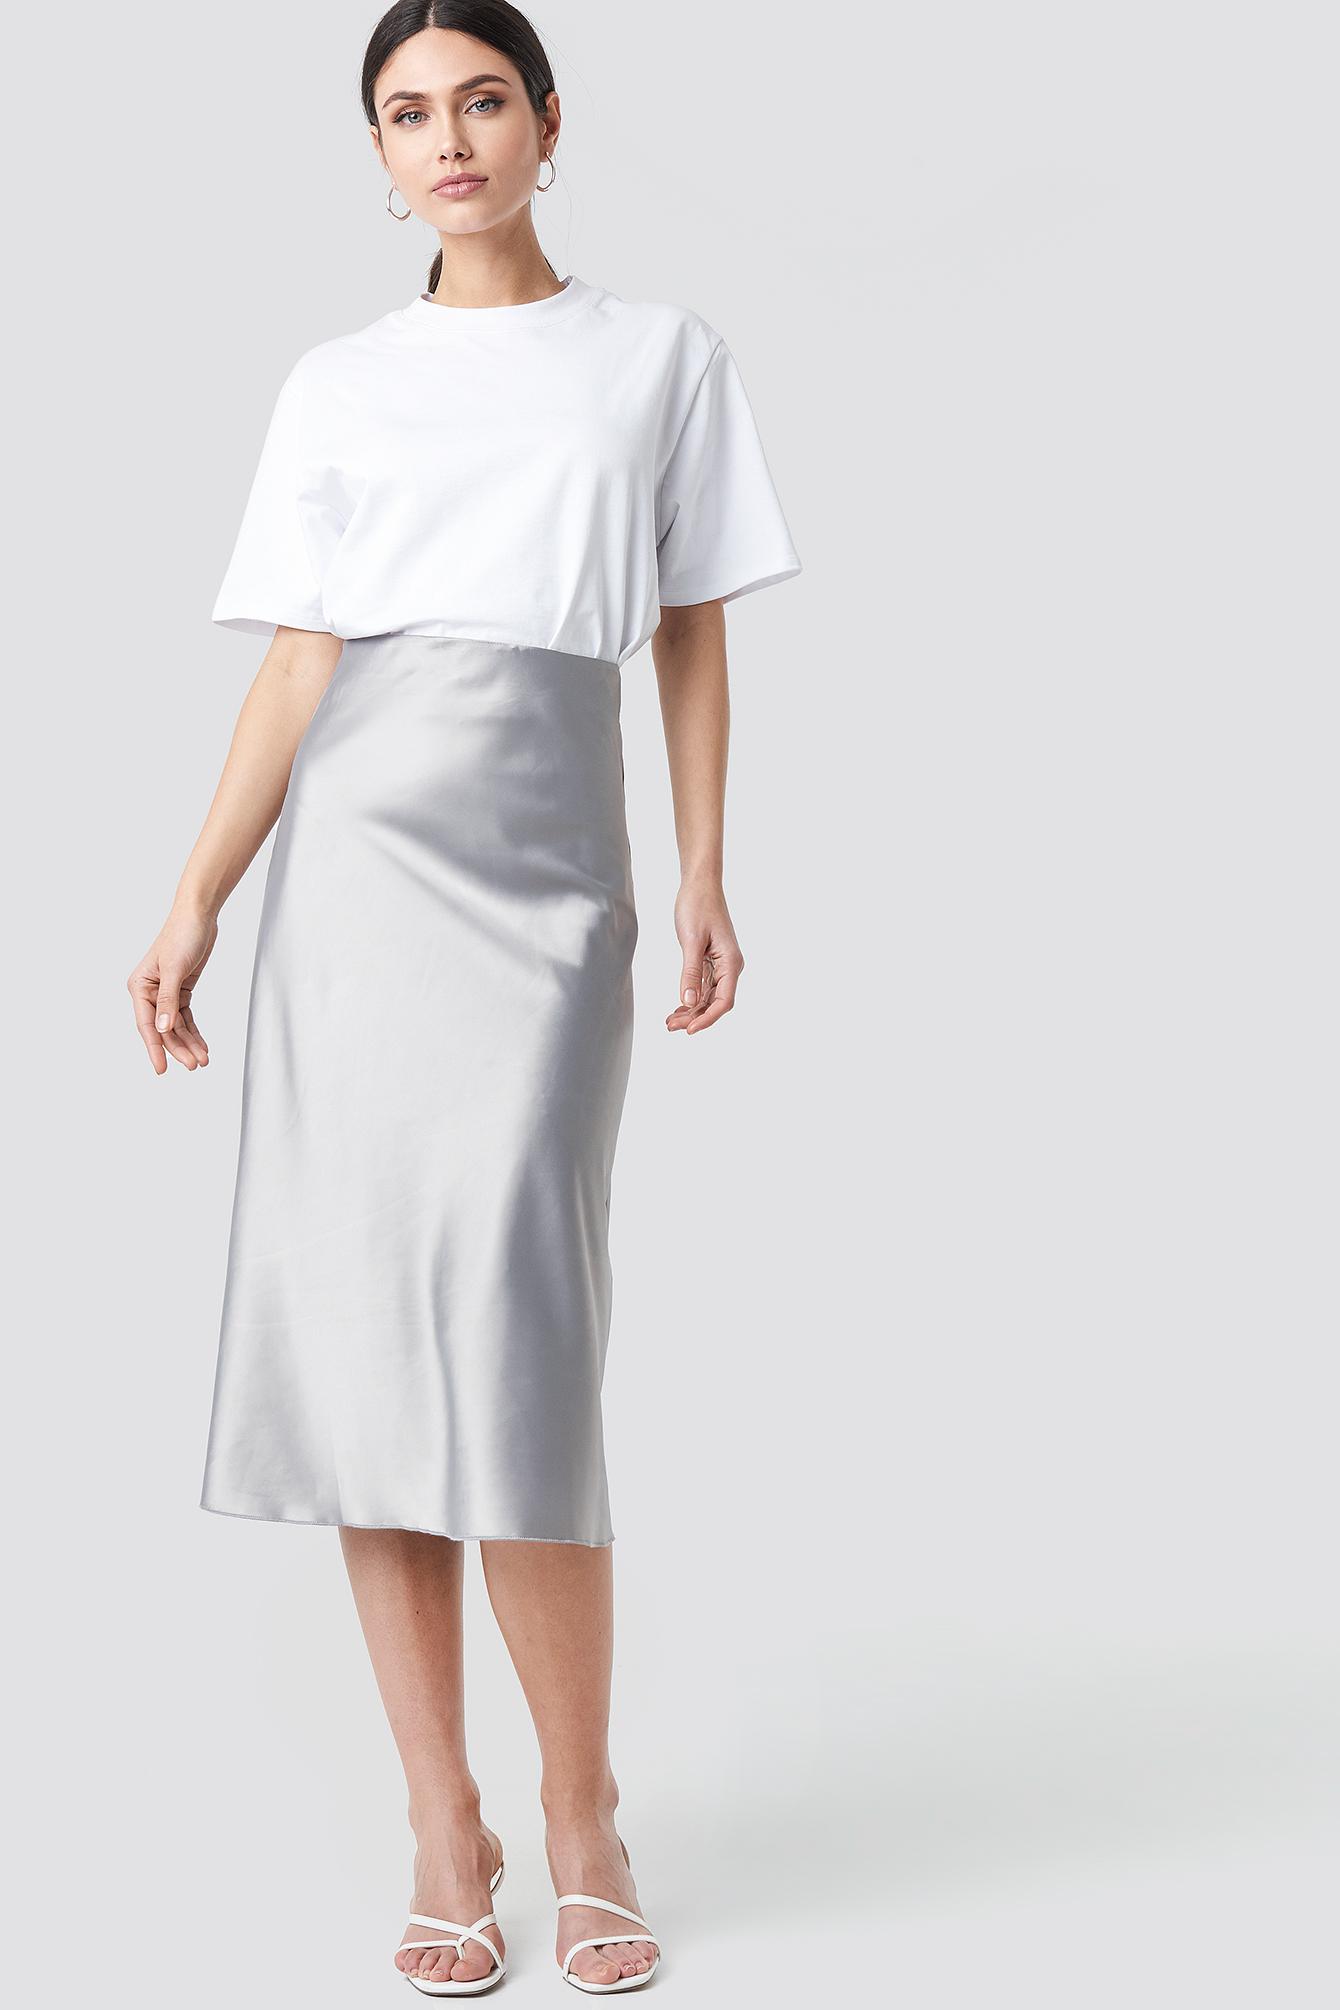 trendyol -  Yol Satin Skirt - Silver